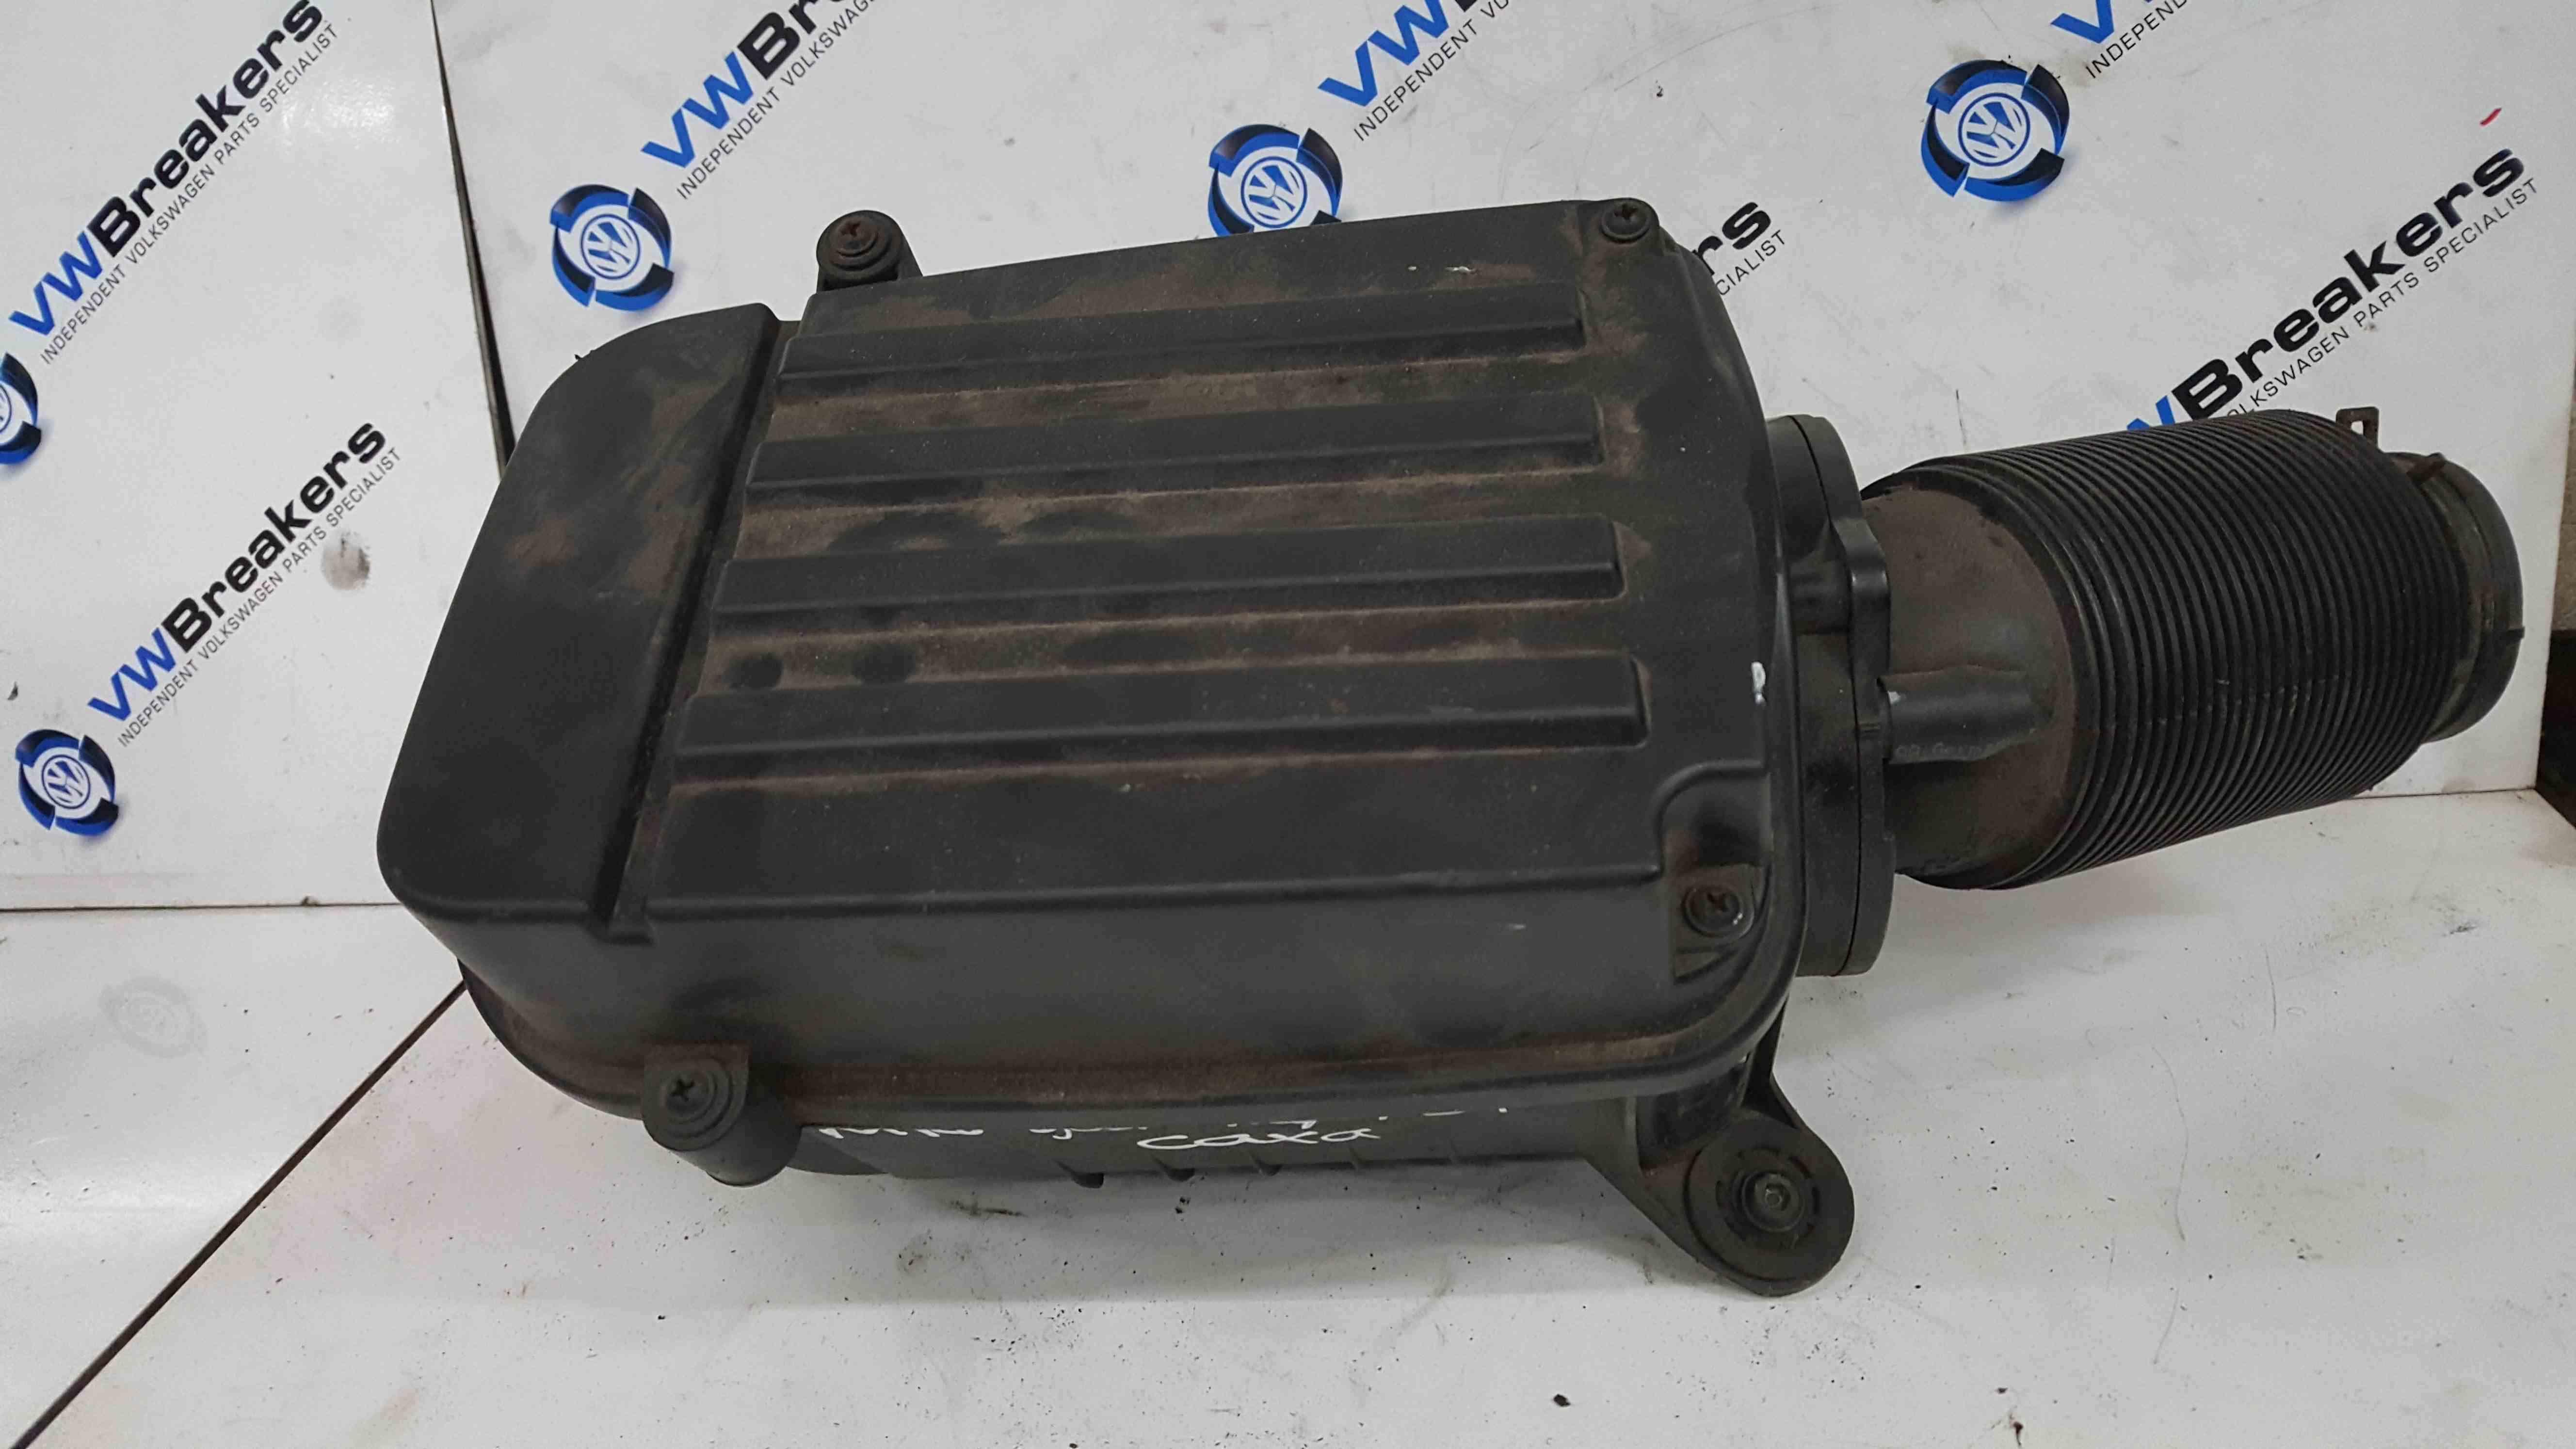 Volkswagen Golf MK6 2009-2012 1.4 TSi Airbox Filter Housing 1K0129607AE